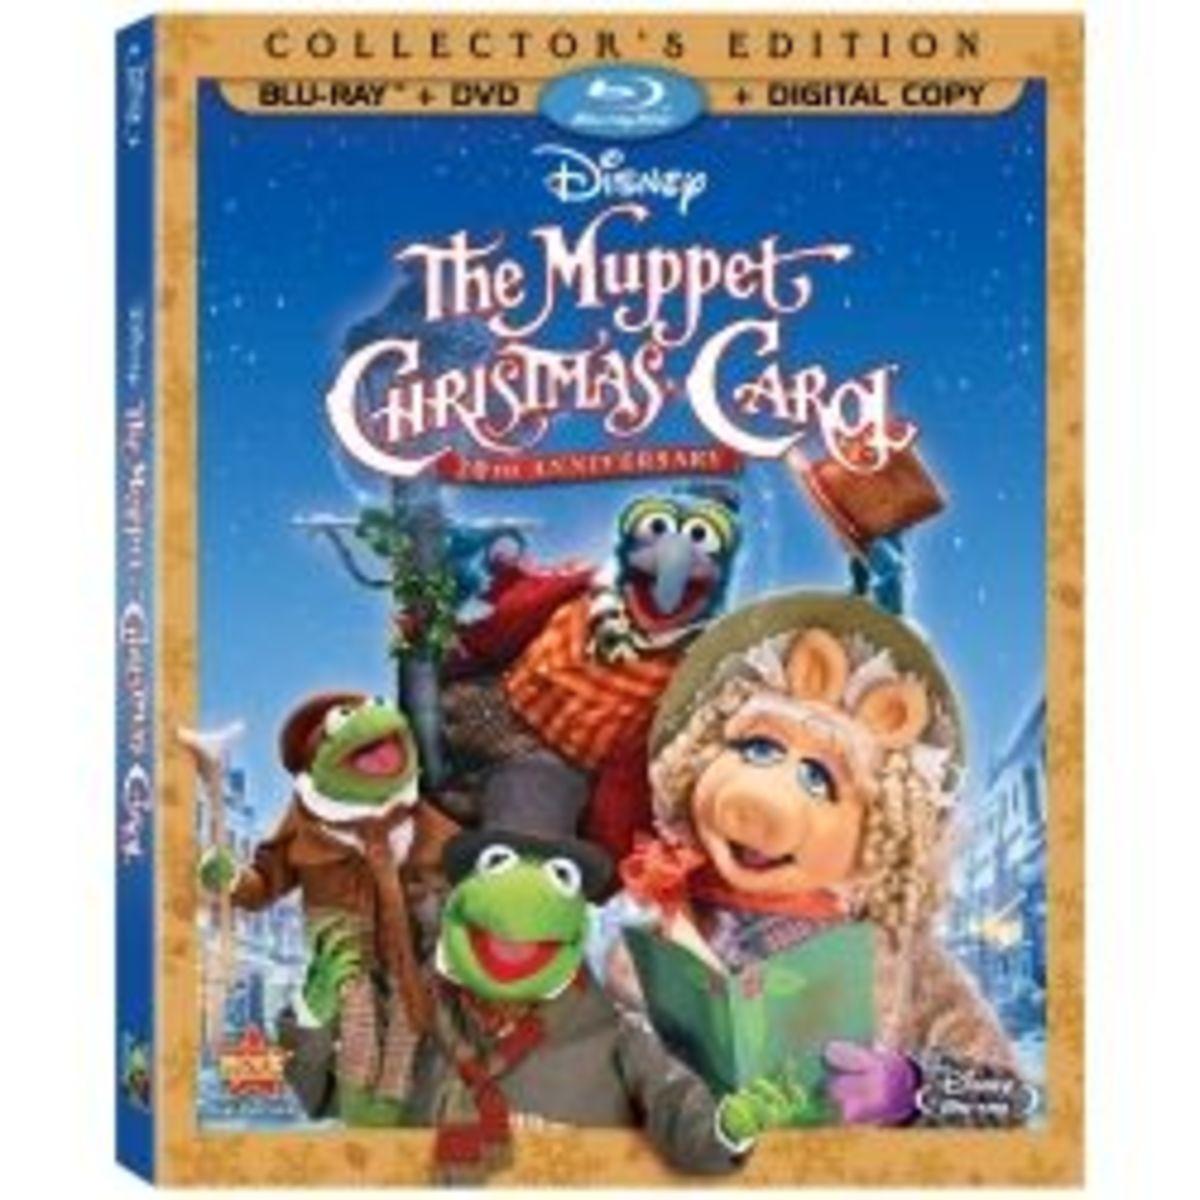 The Muppets Christmas Carol Blu-ray